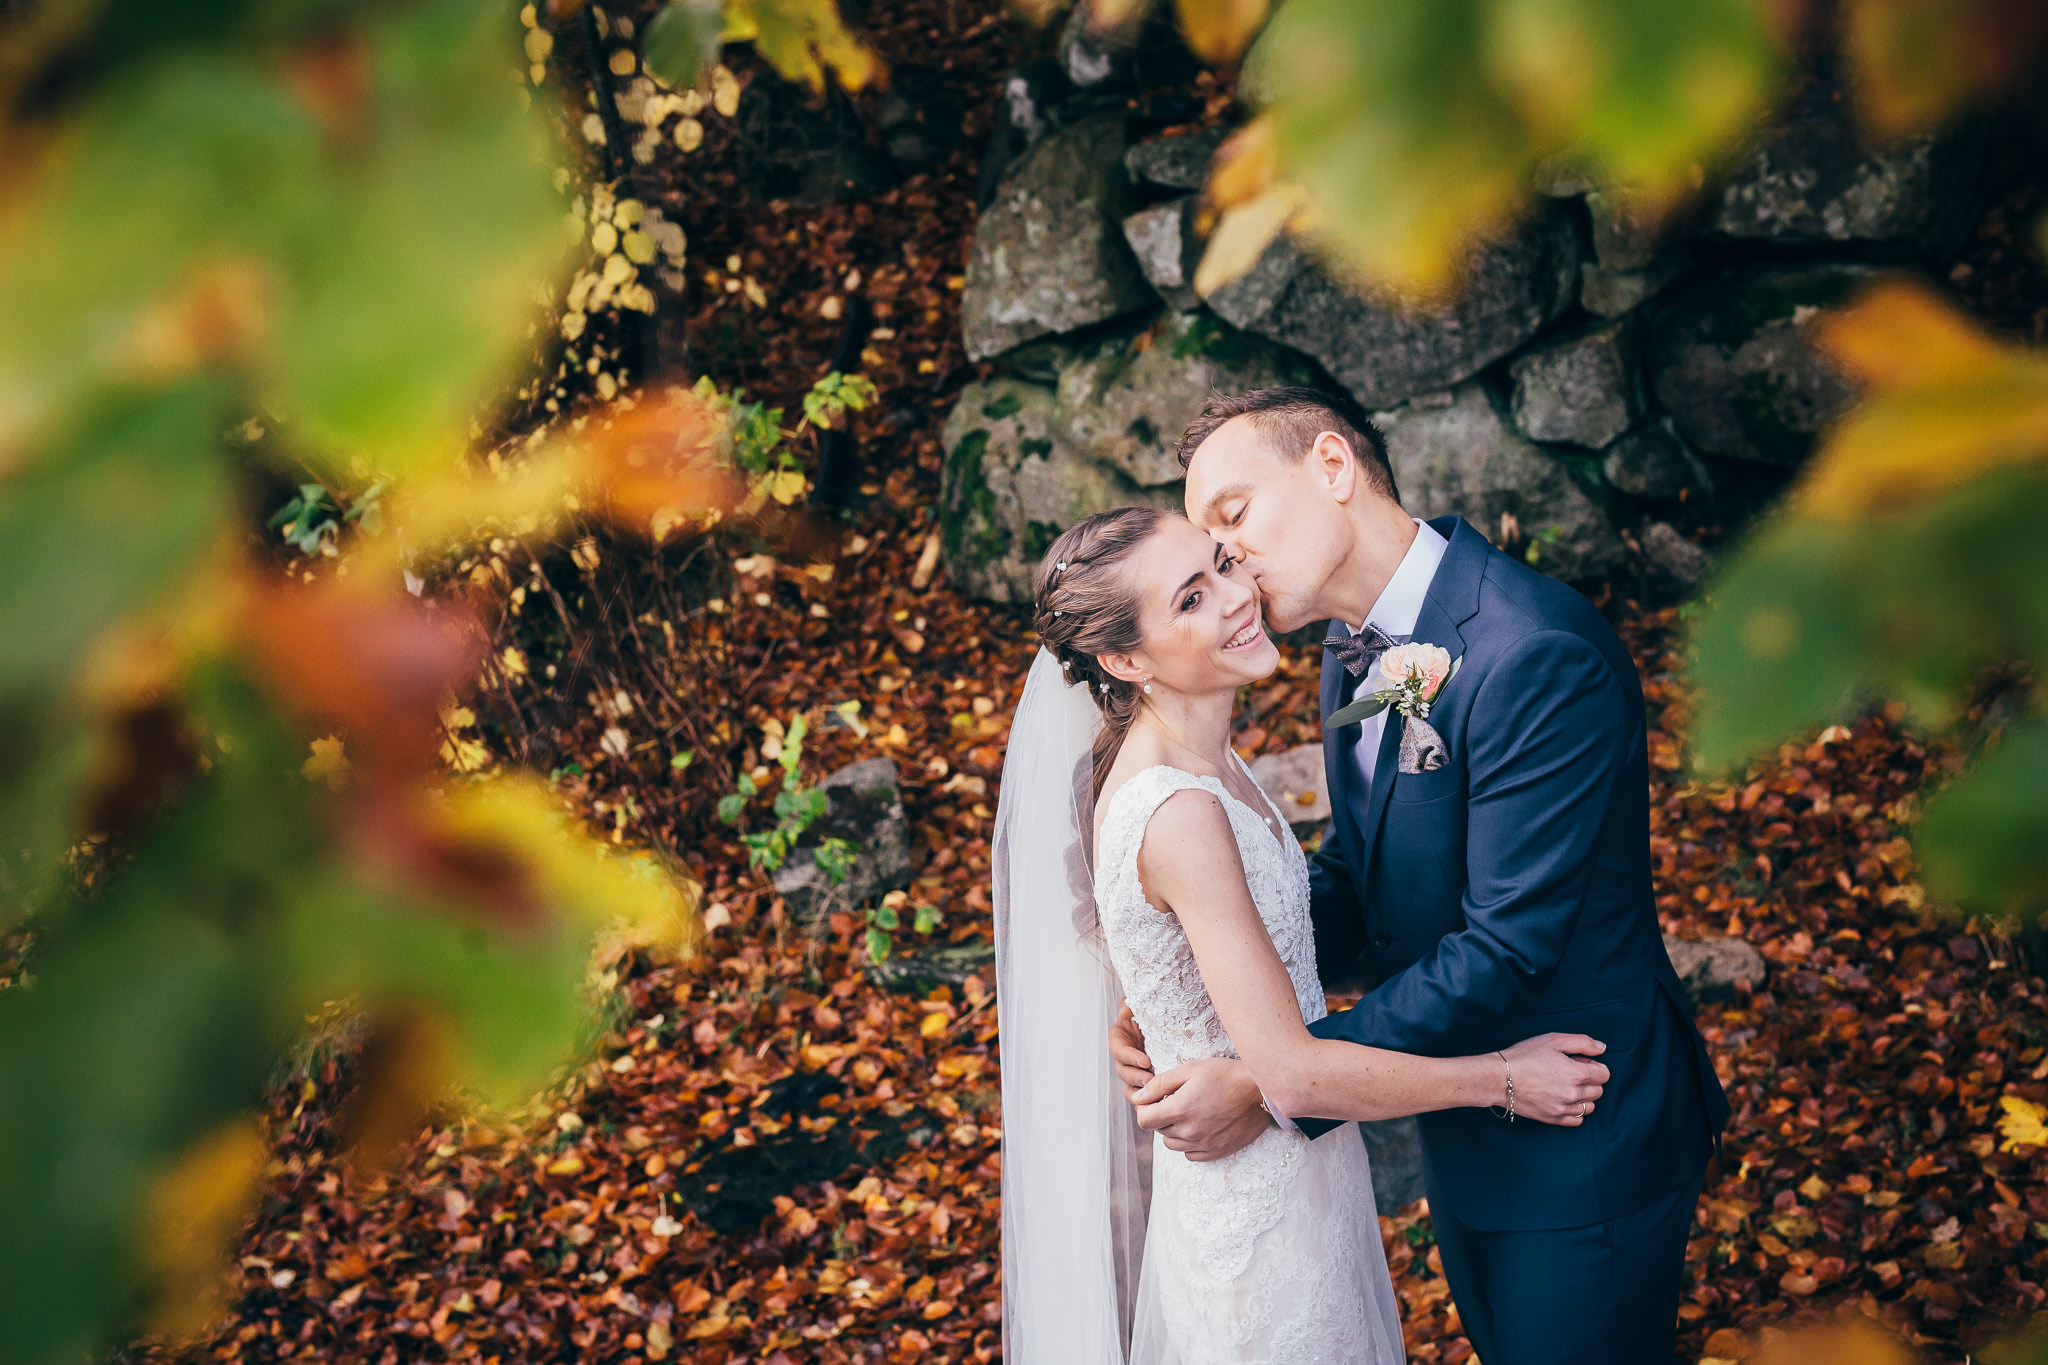 Norway+wedding+photographer+elopement+pre+wedding+Rogaland+bryllupsfotograf+Casey+Arneson-219.jpg